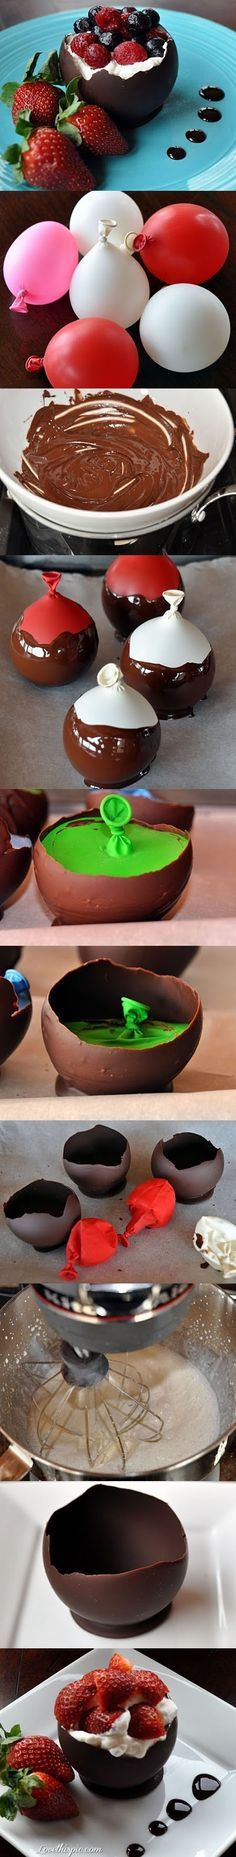 DIY Chocolate Strawberry Cream Desert food diy crafts food crafts home crafts…